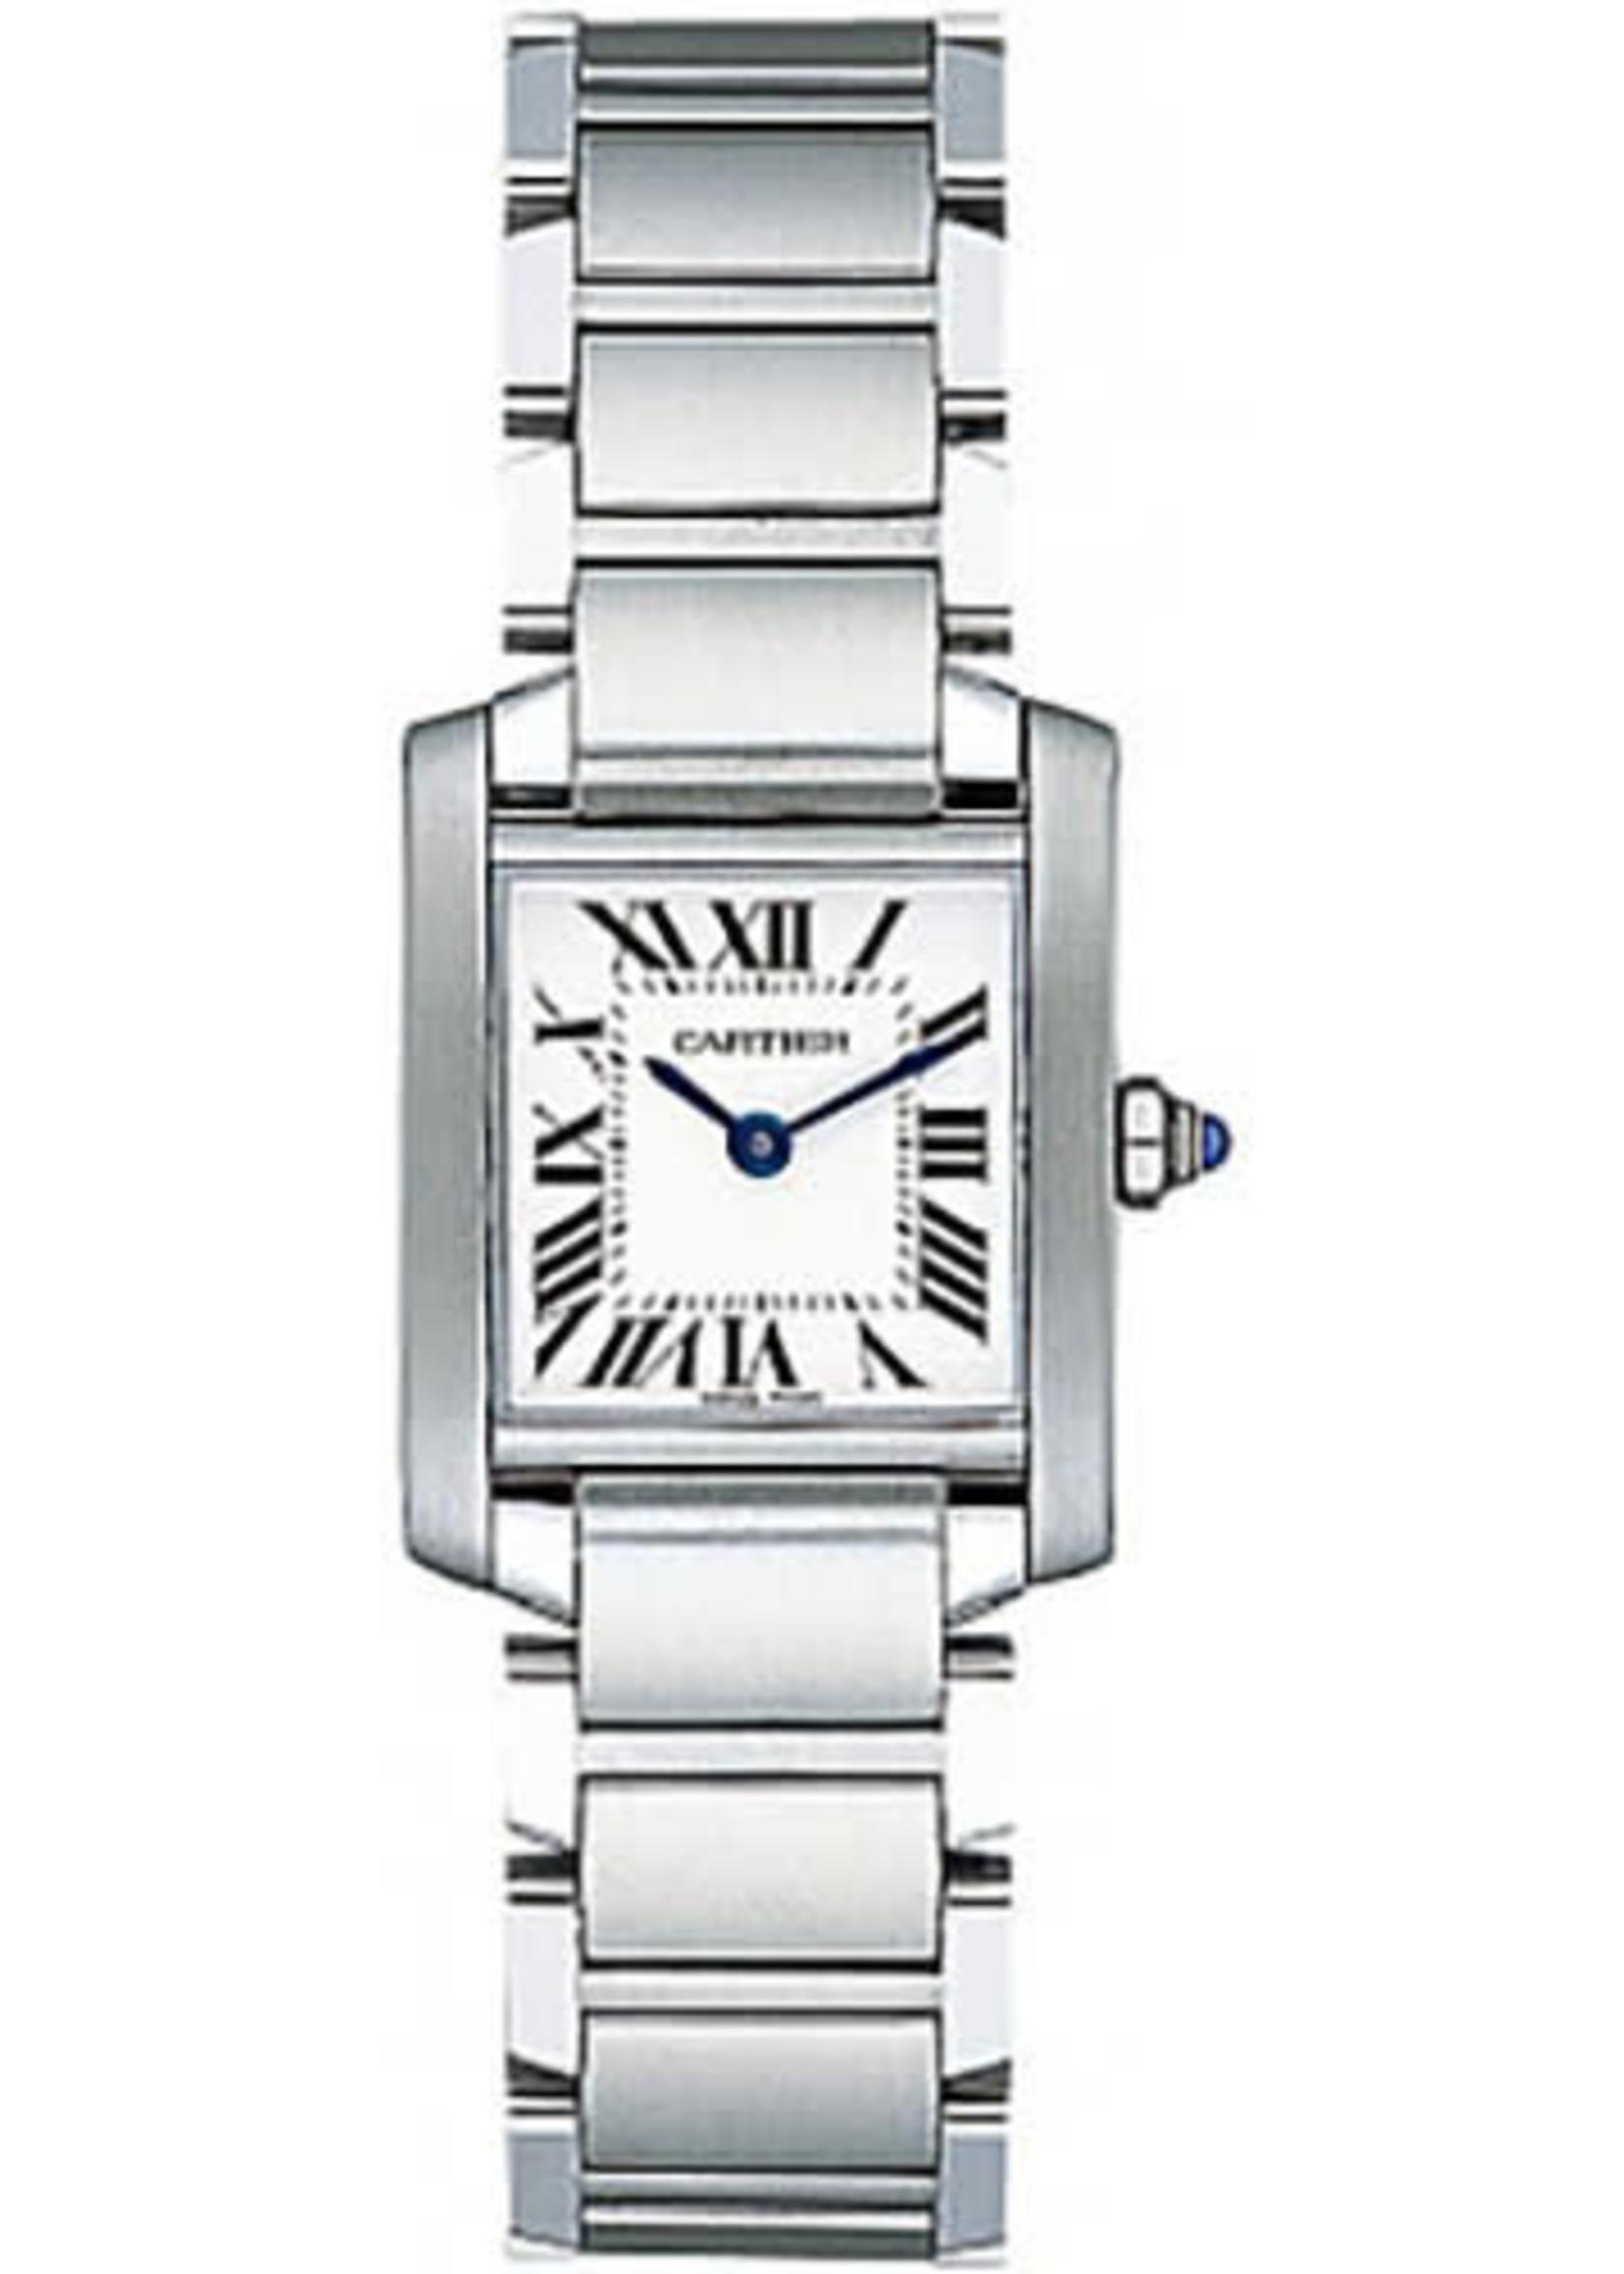 Cartier CARTIER TANK FRANCAISE 25MM SMALL SIZE #W51008Q3